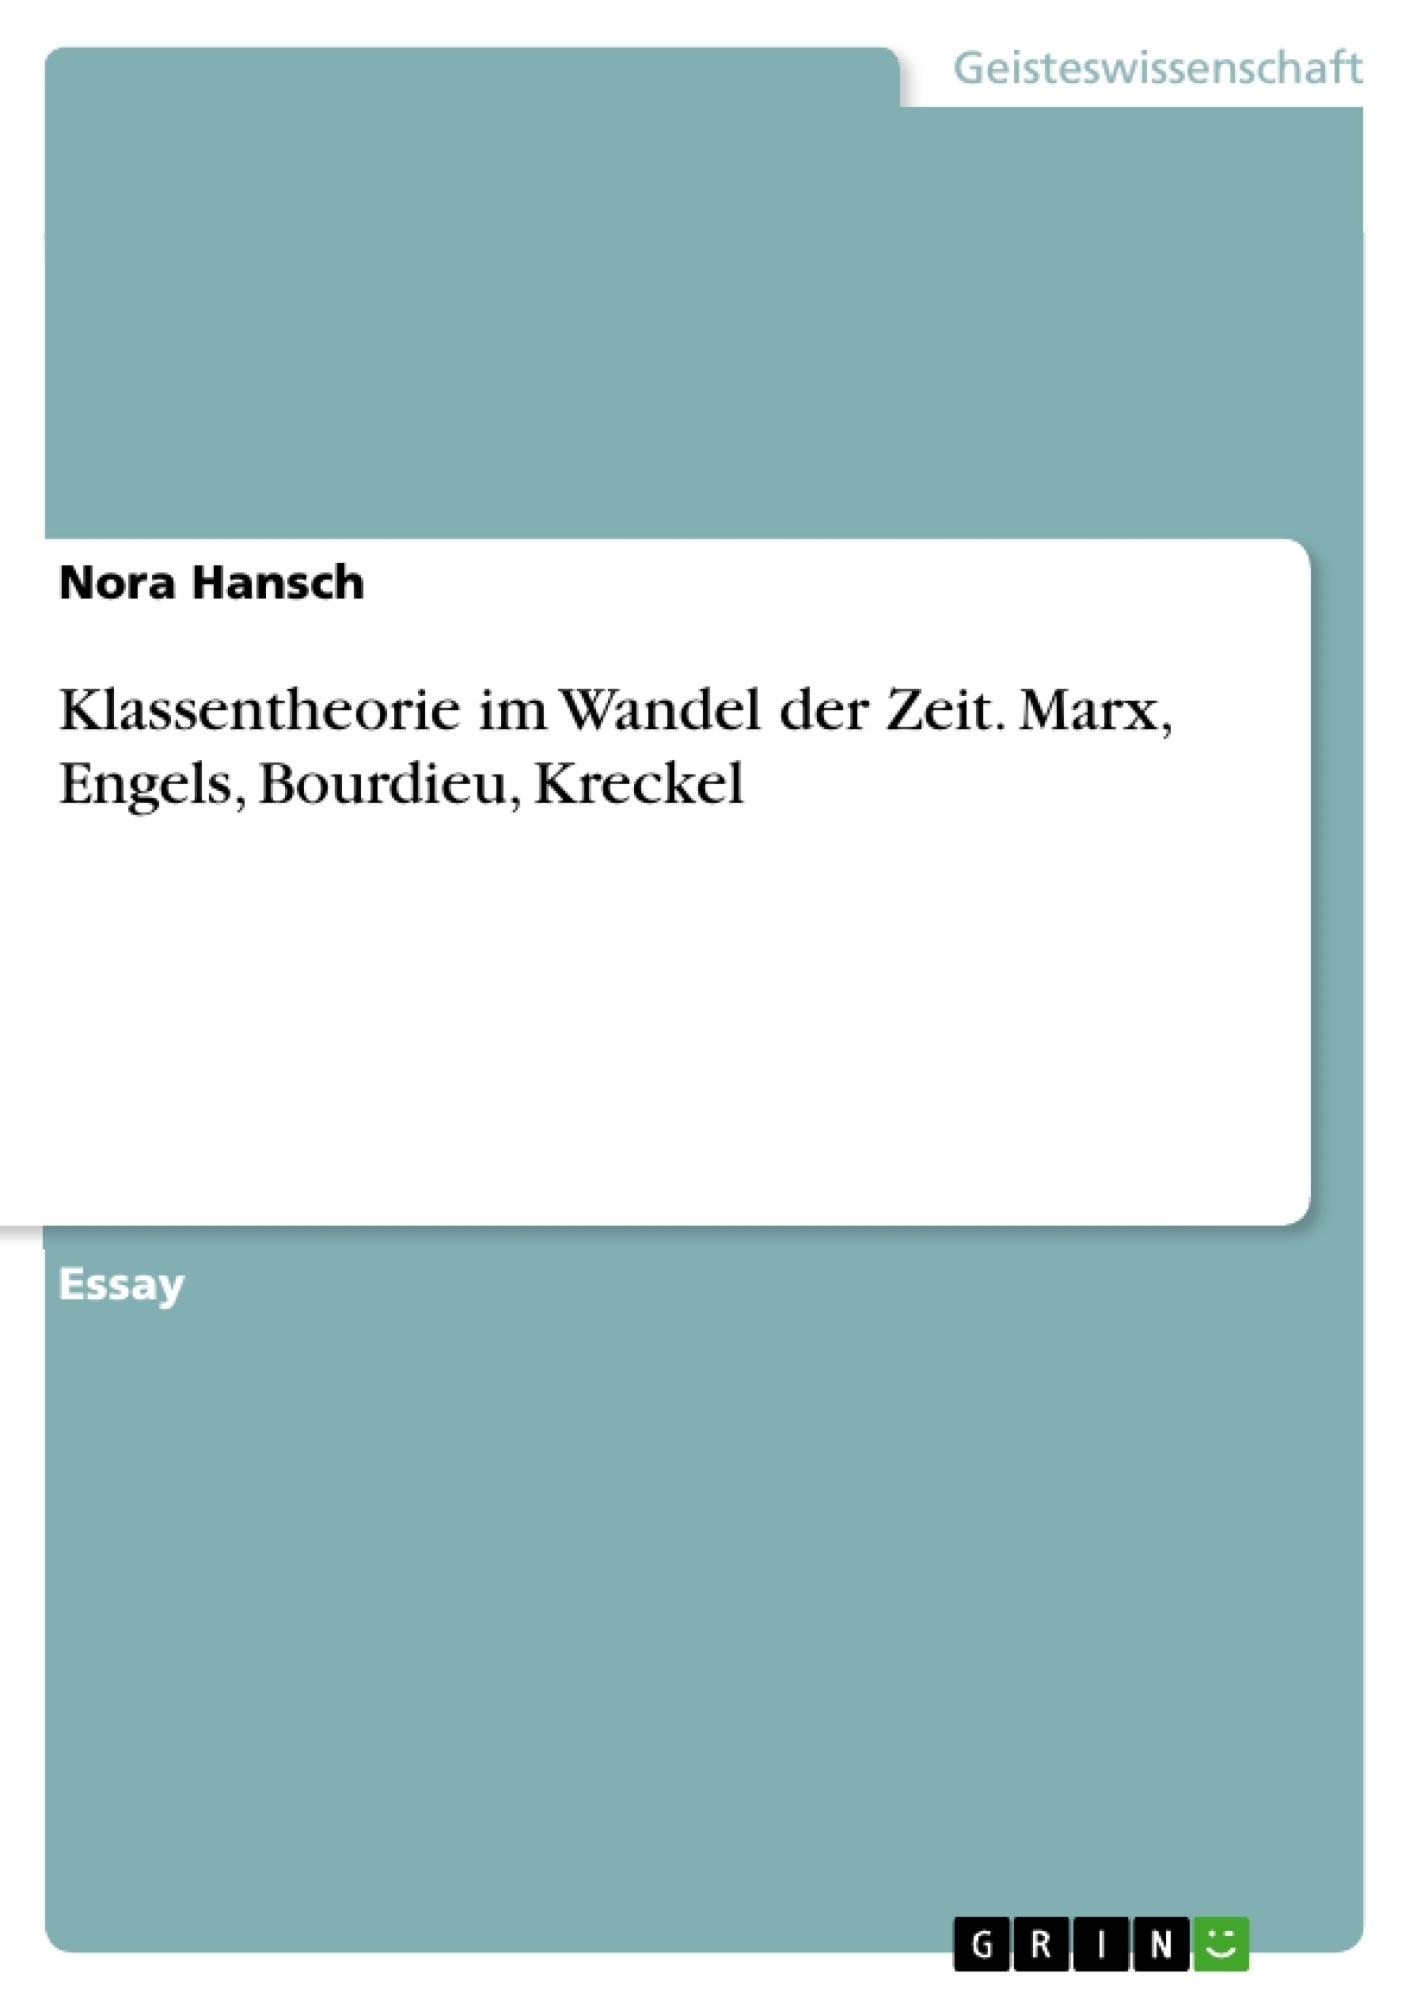 Titel: Klassentheorie im Wandel der Zeit. Marx, Engels, Bourdieu, Kreckel